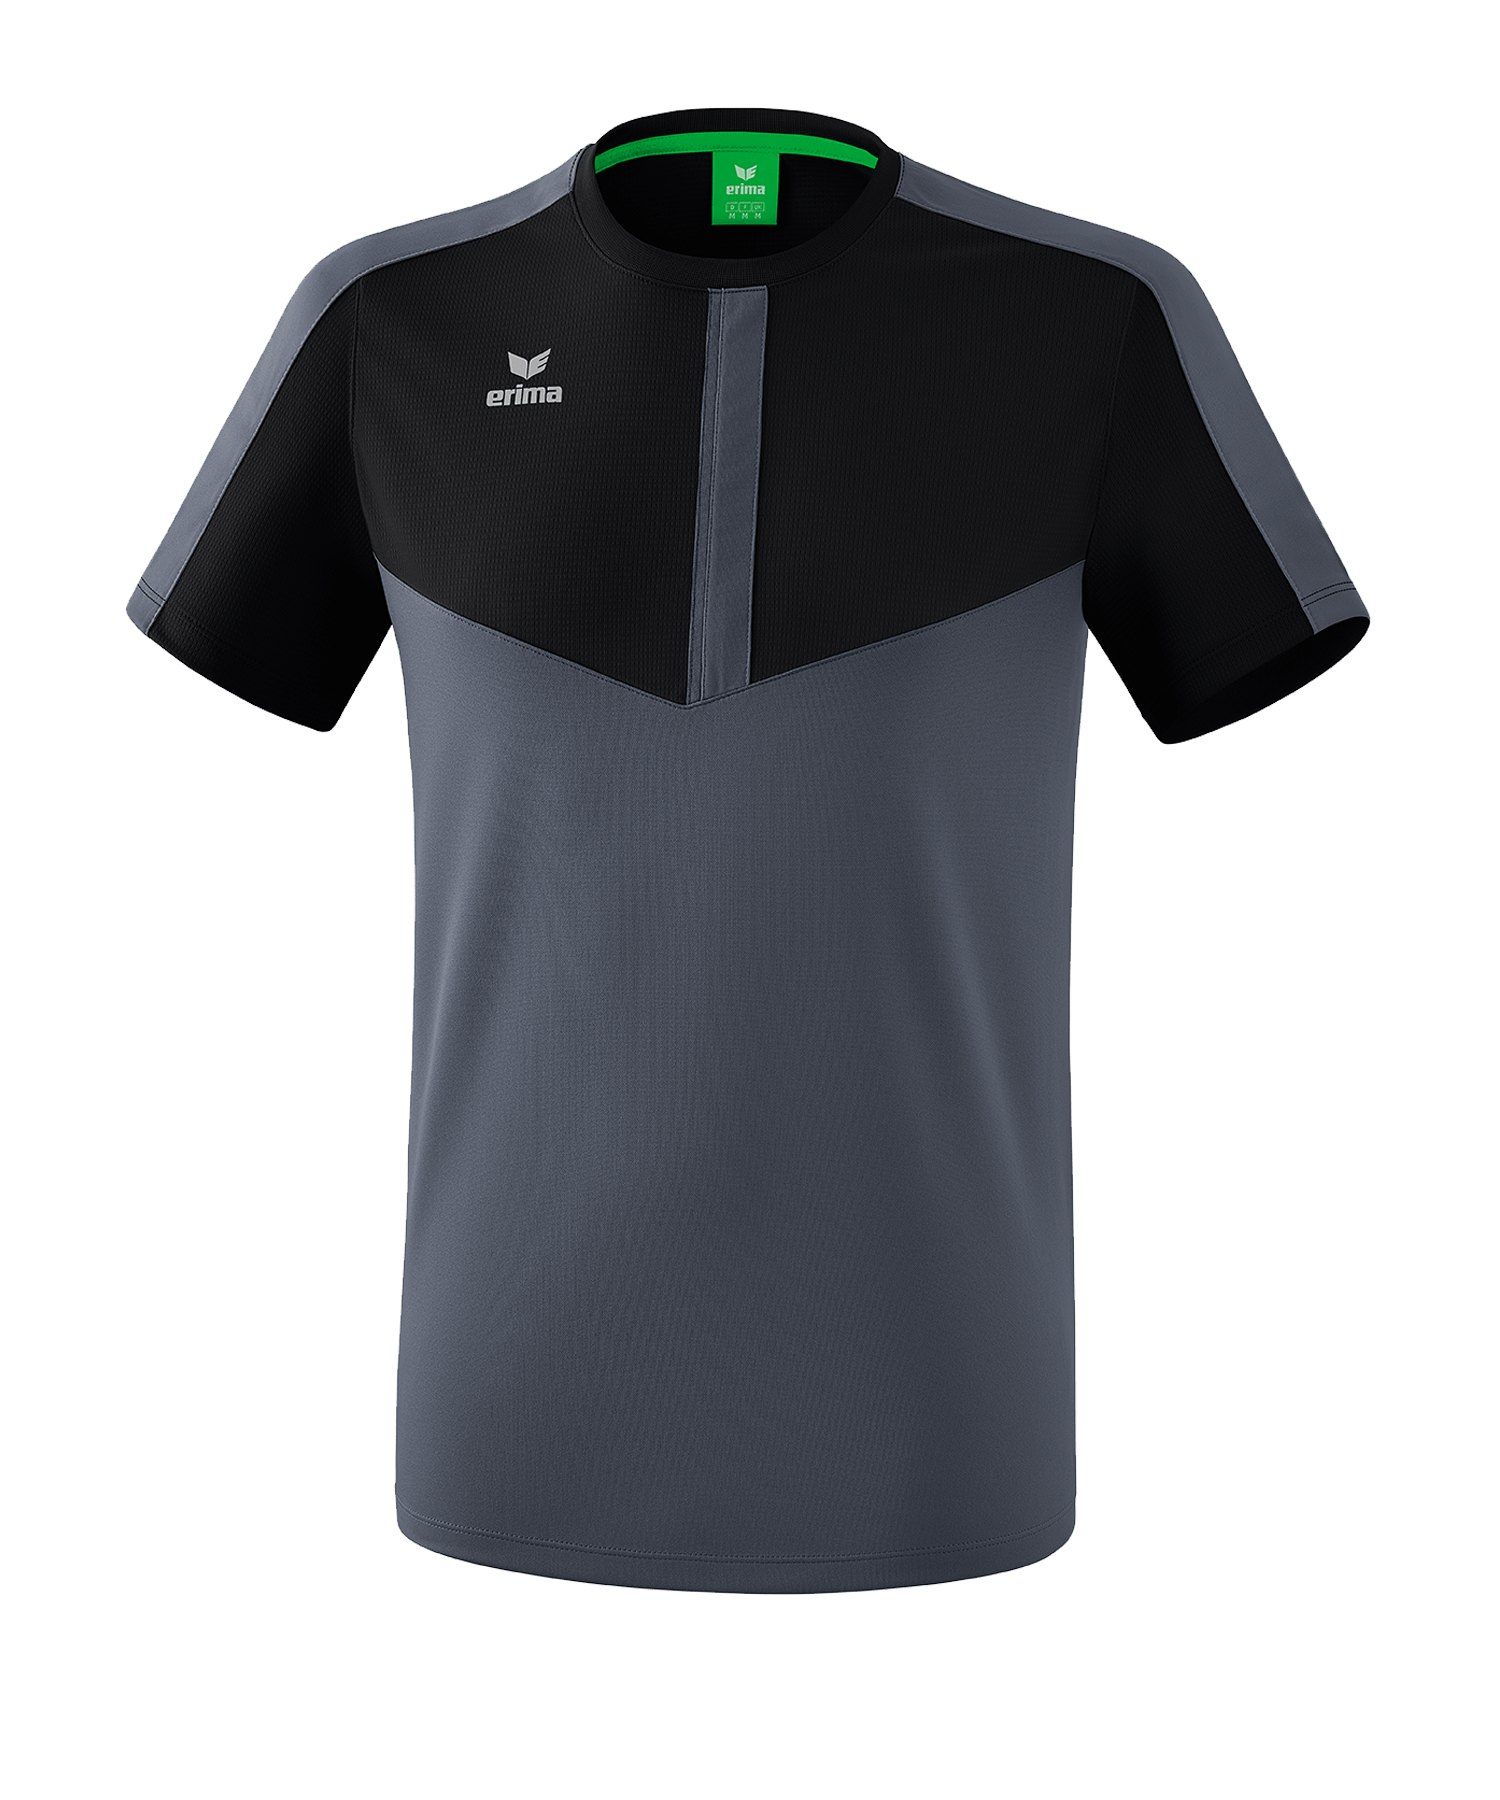 Erima Squad T-Shirt Kids Schwarz Grau - schwarz